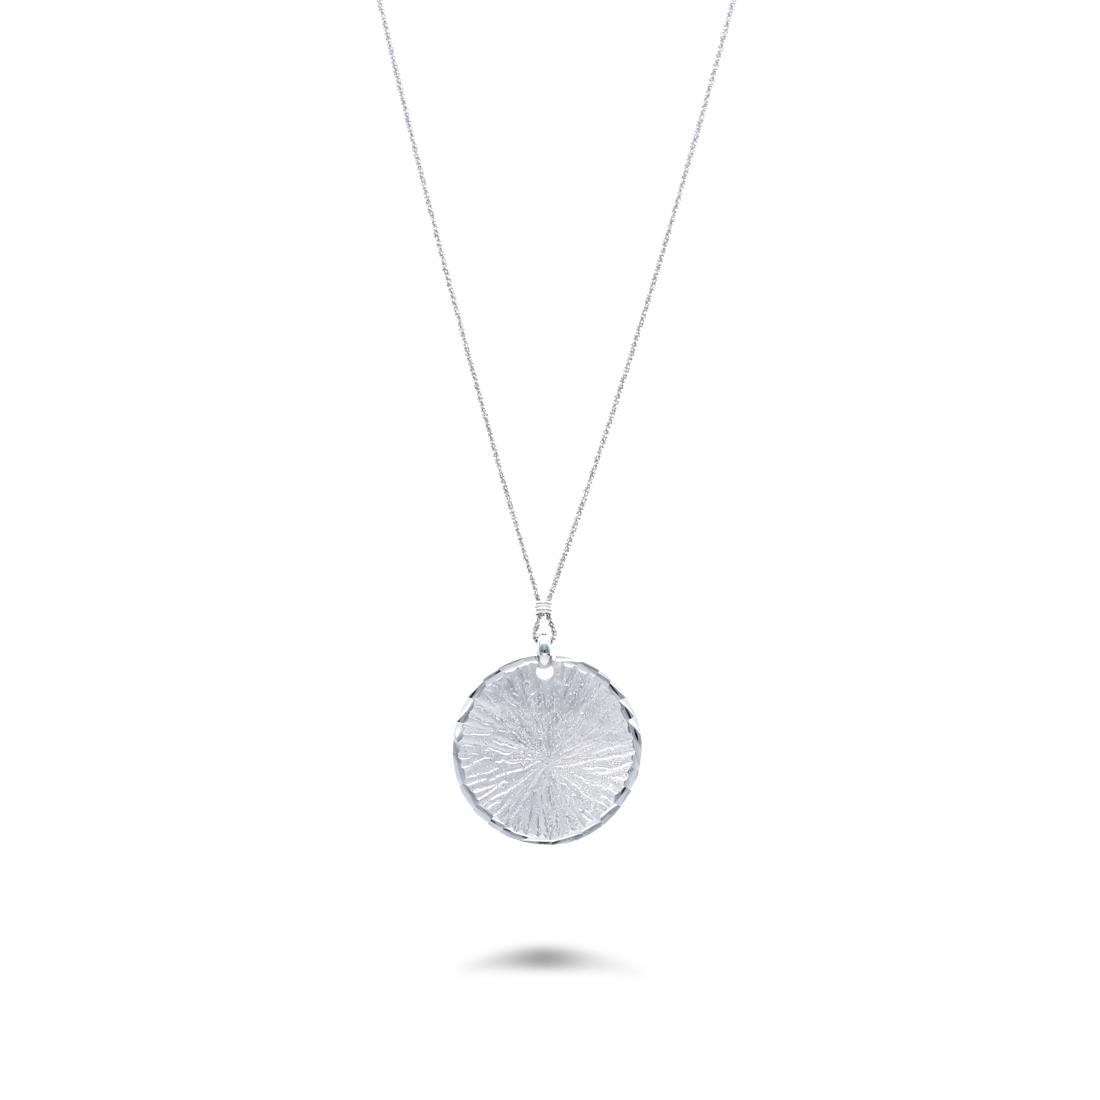 Collana in argento - NOMINATION